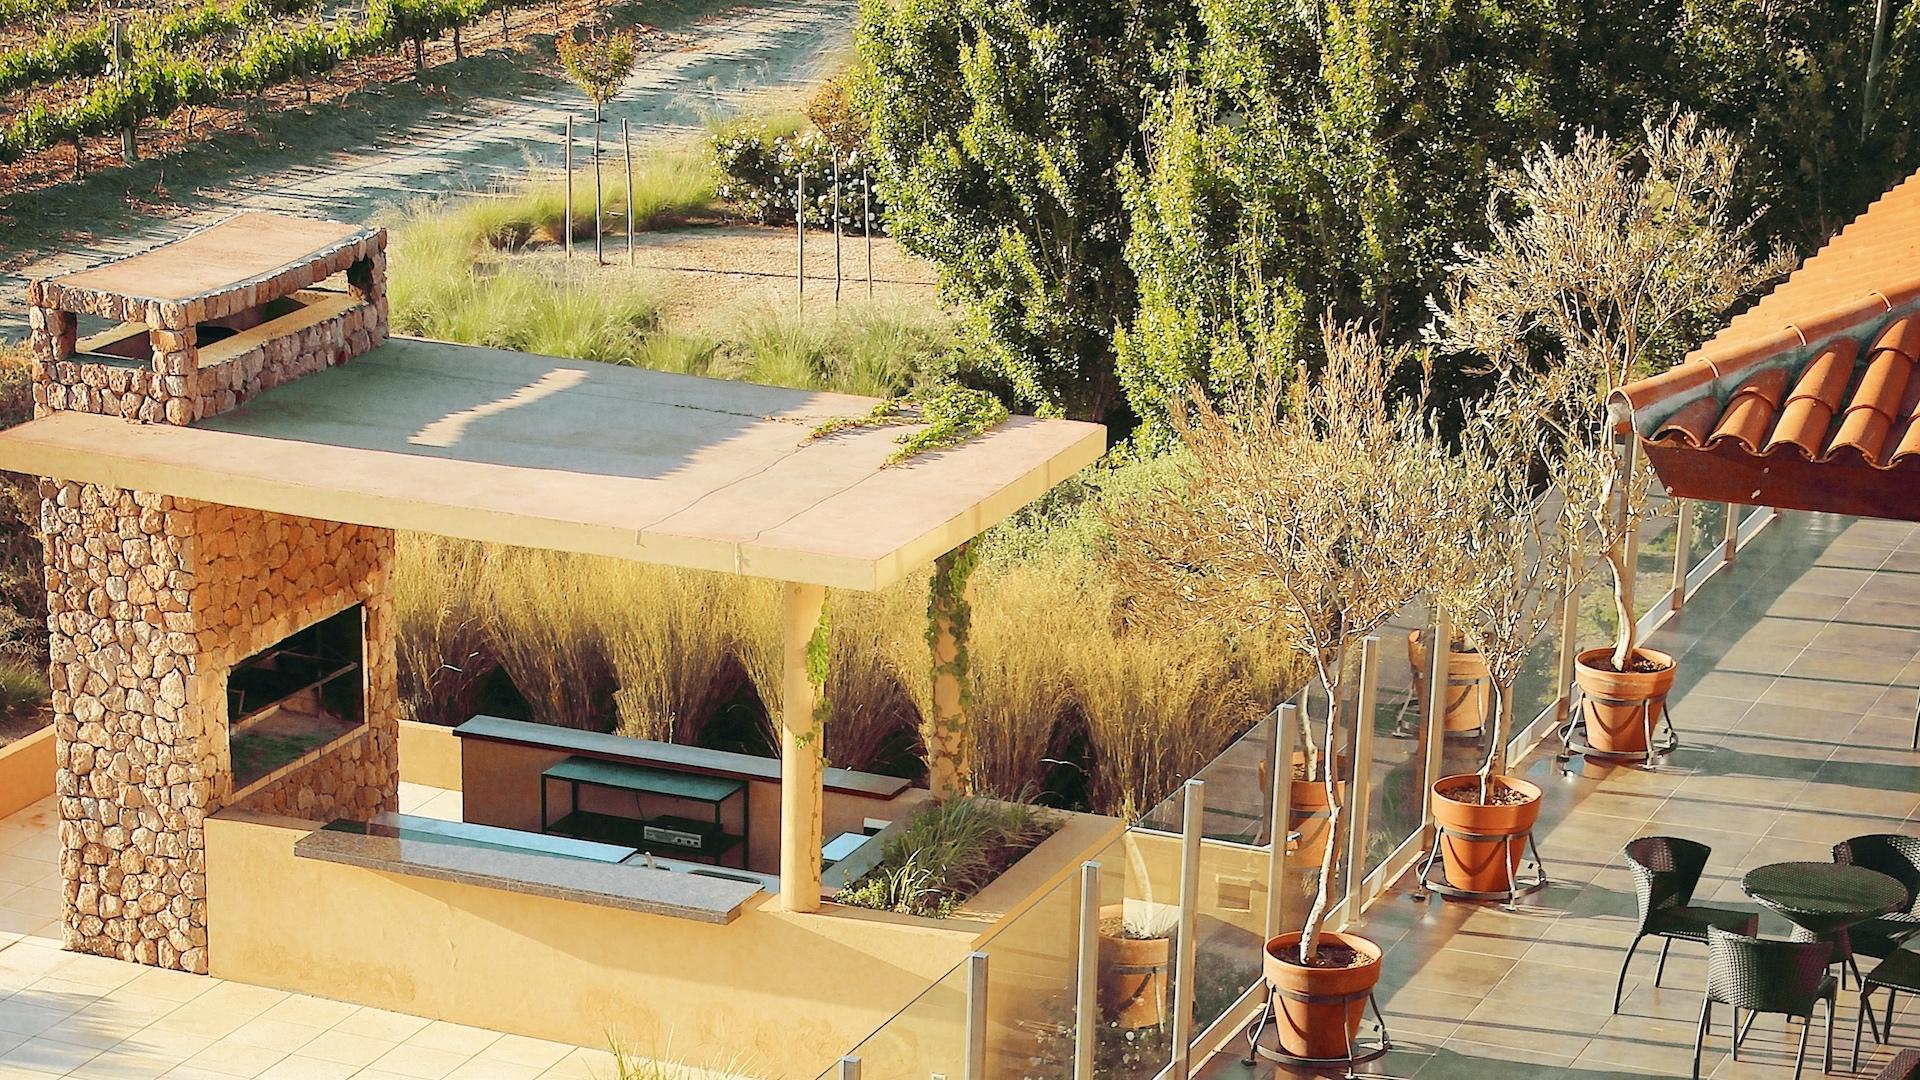 grace-hotel-cafayate-salta-resort-argentina-norbertosica-16102016-in6